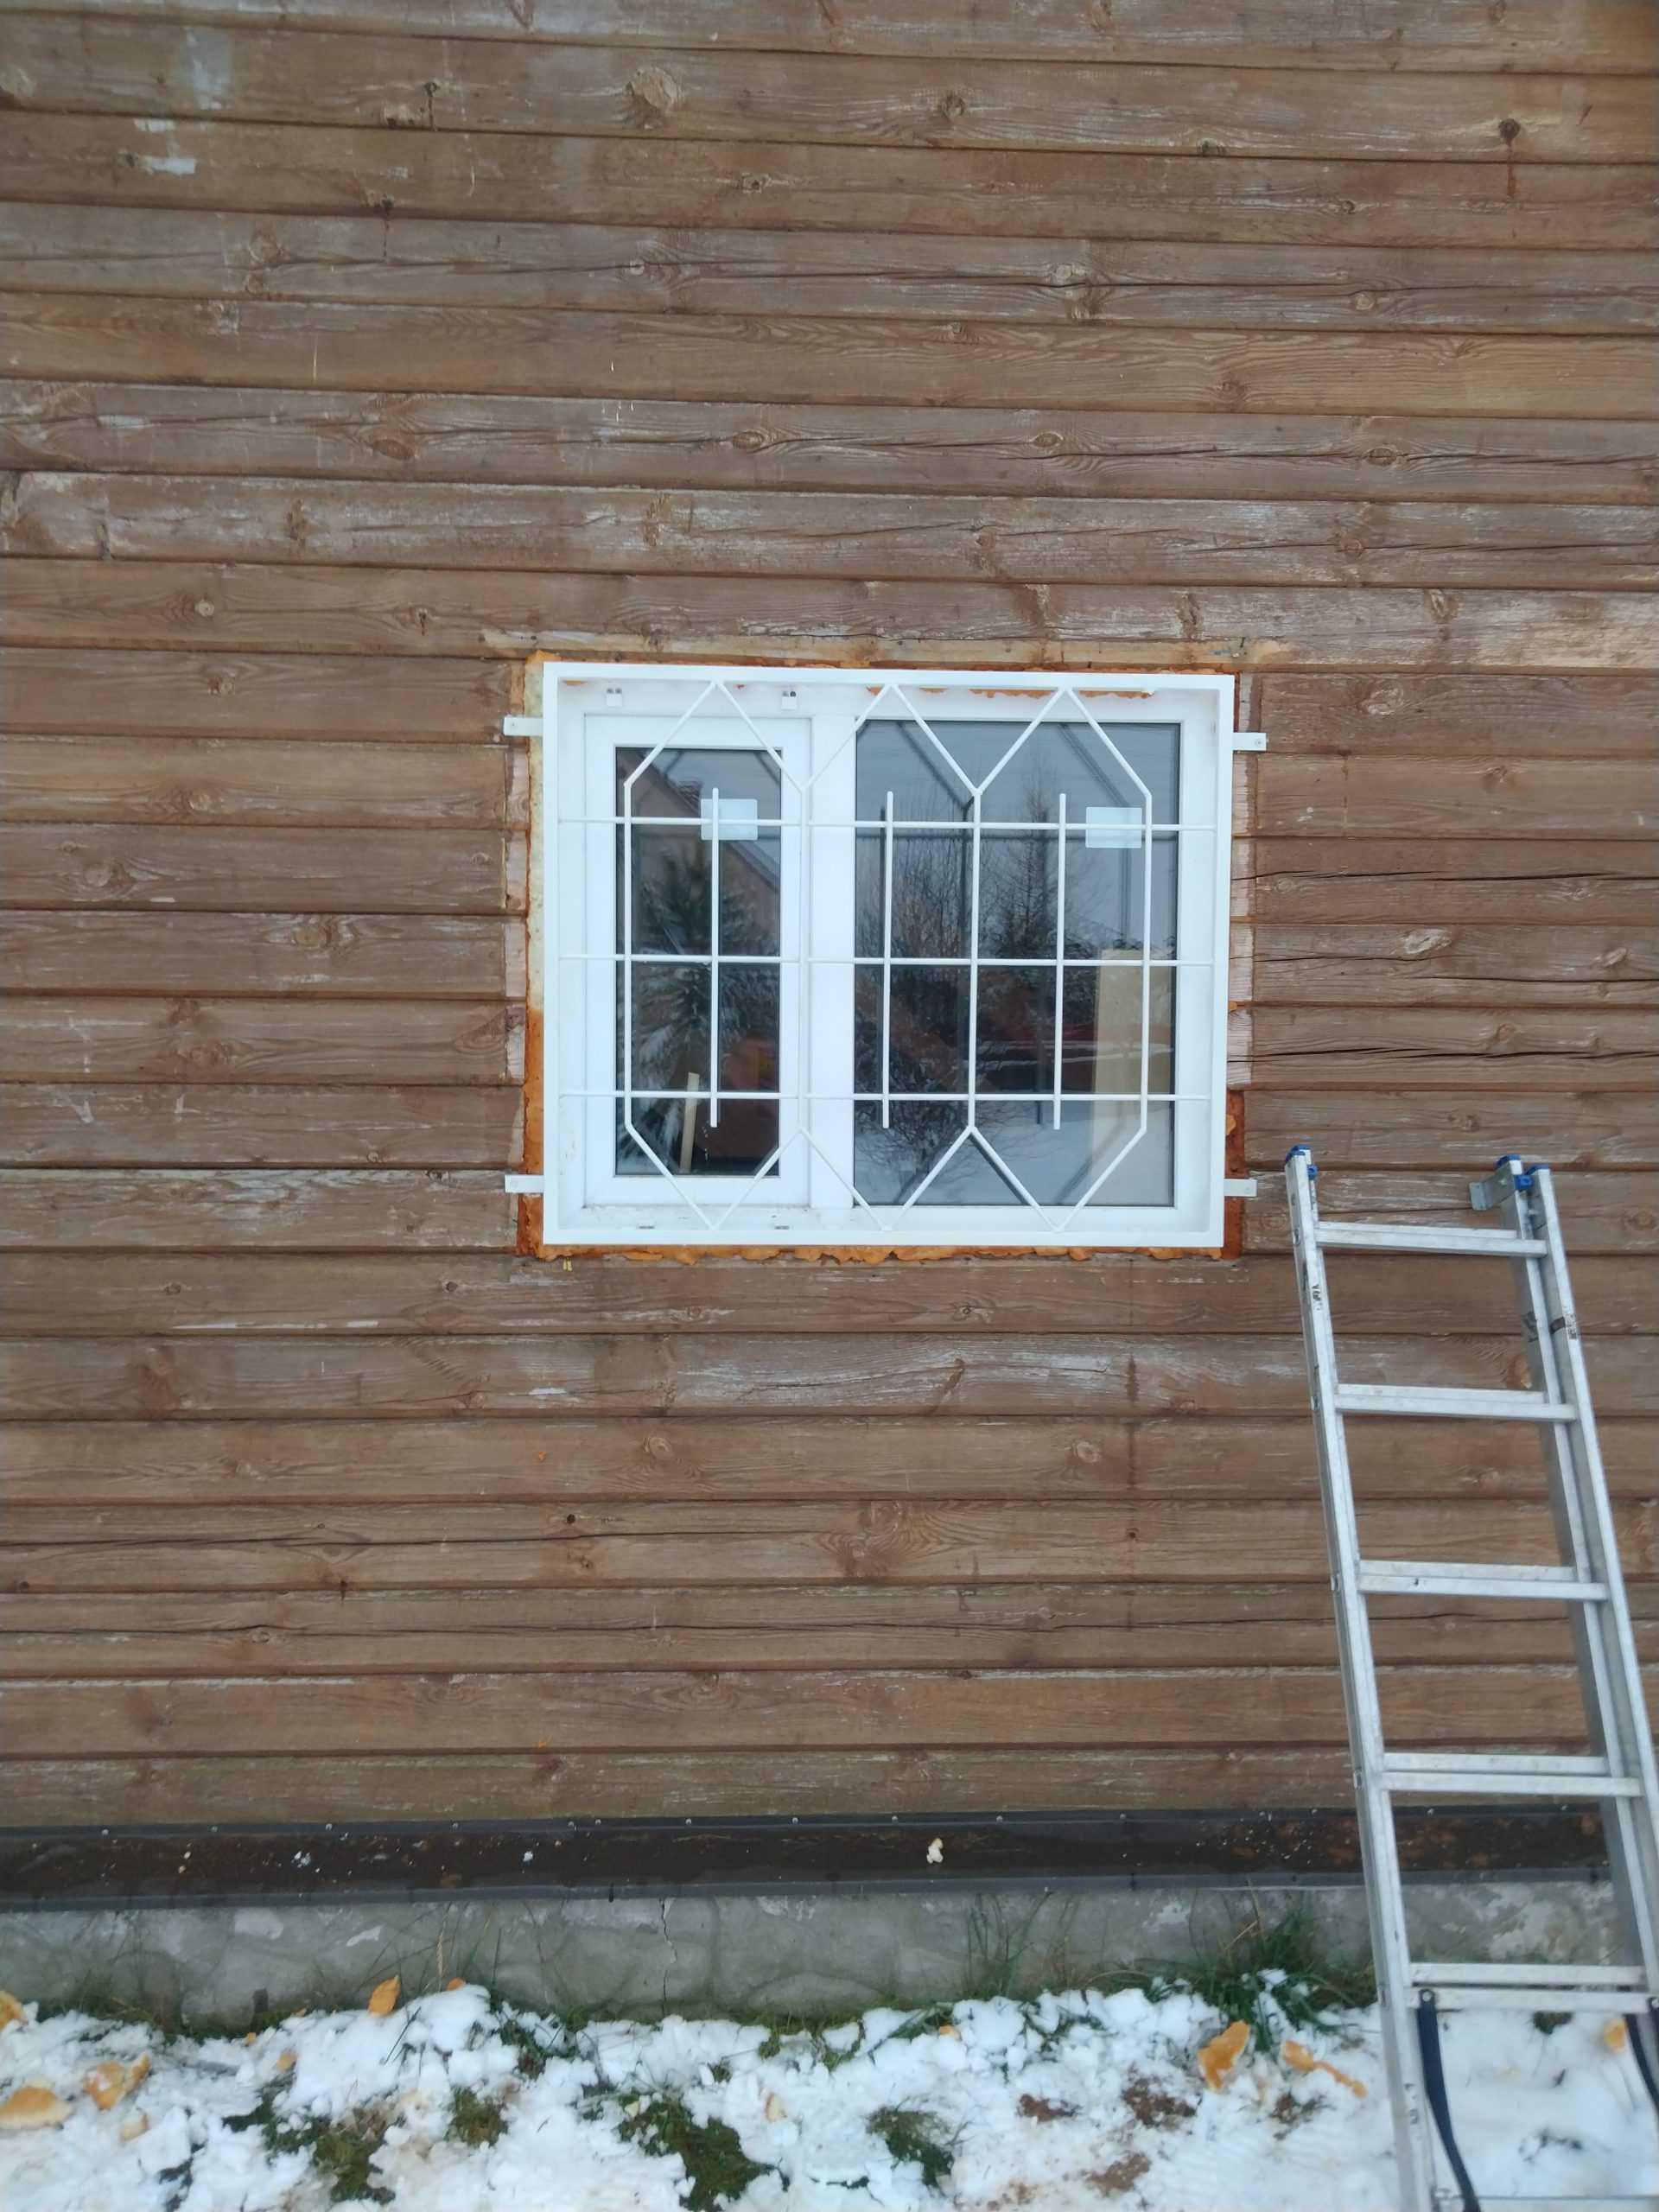 Решетки на окна в деревянном доме Фото 1